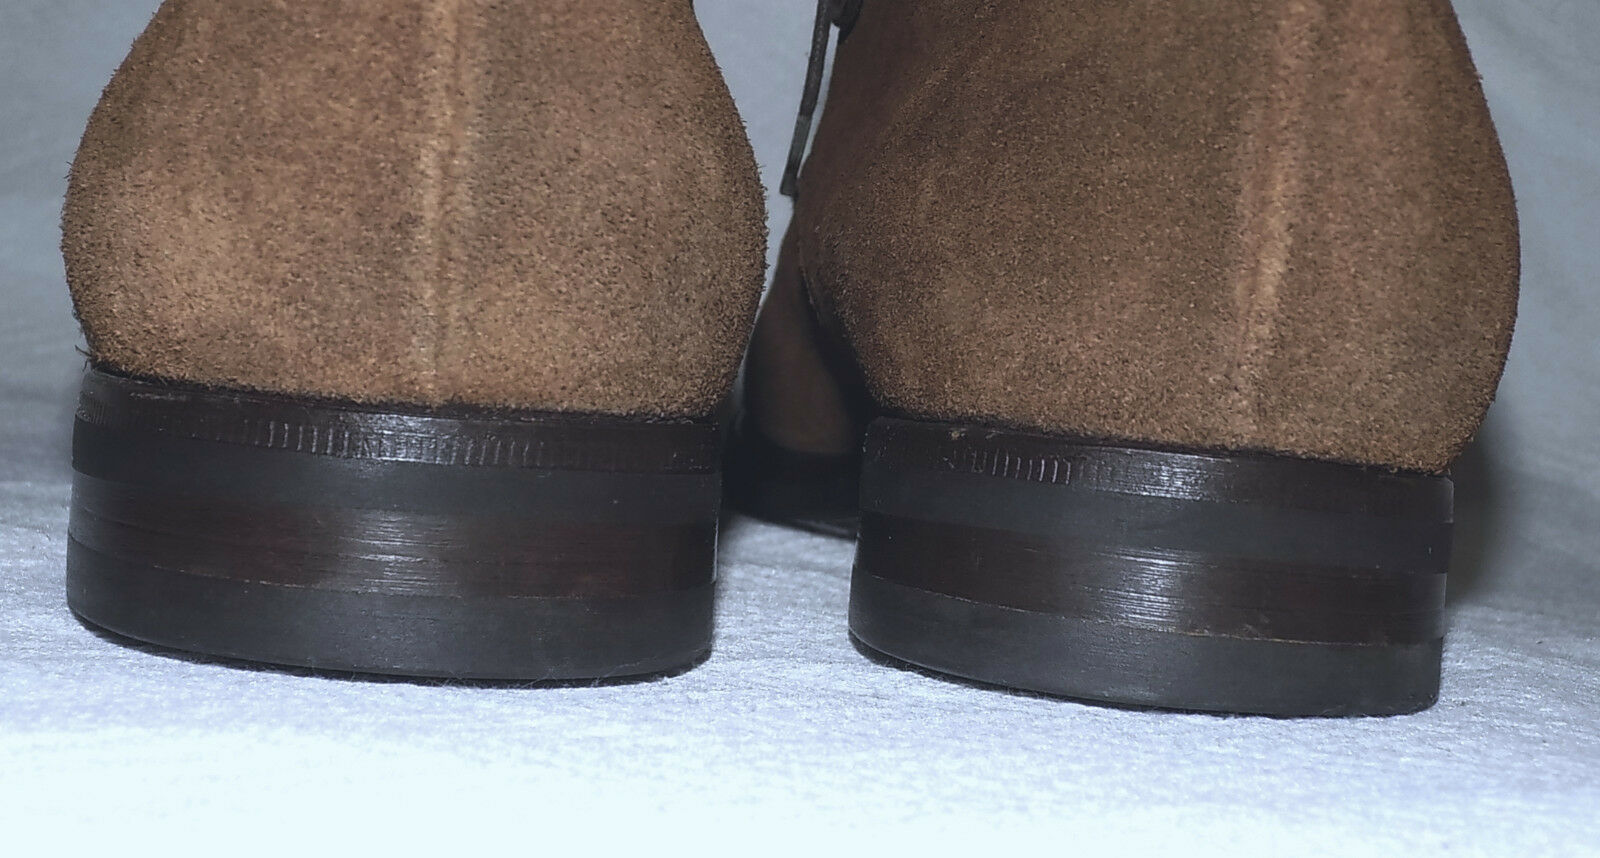 Franceschetti 100% BARNEY'S New York -HANDMADE 100% Franceschetti Suede Shoes-Camel-Size 10M-Nice 2276fe